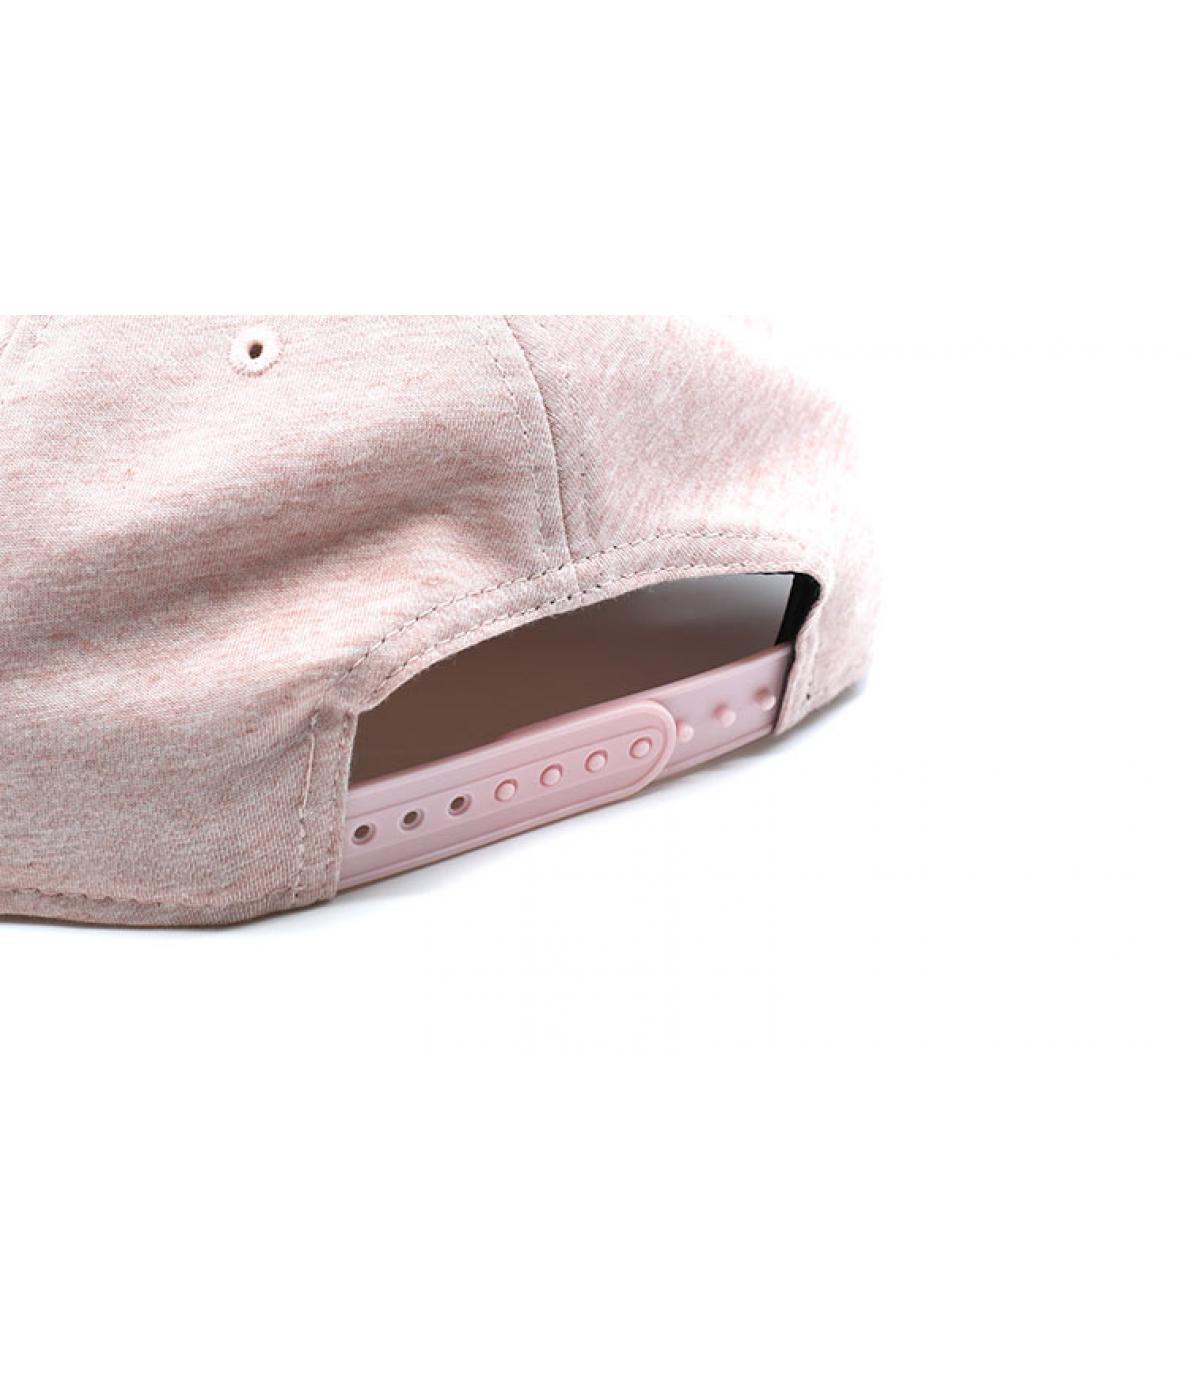 Details Snapback Jersey Brights 9Fifty NY pink - Abbildung 5